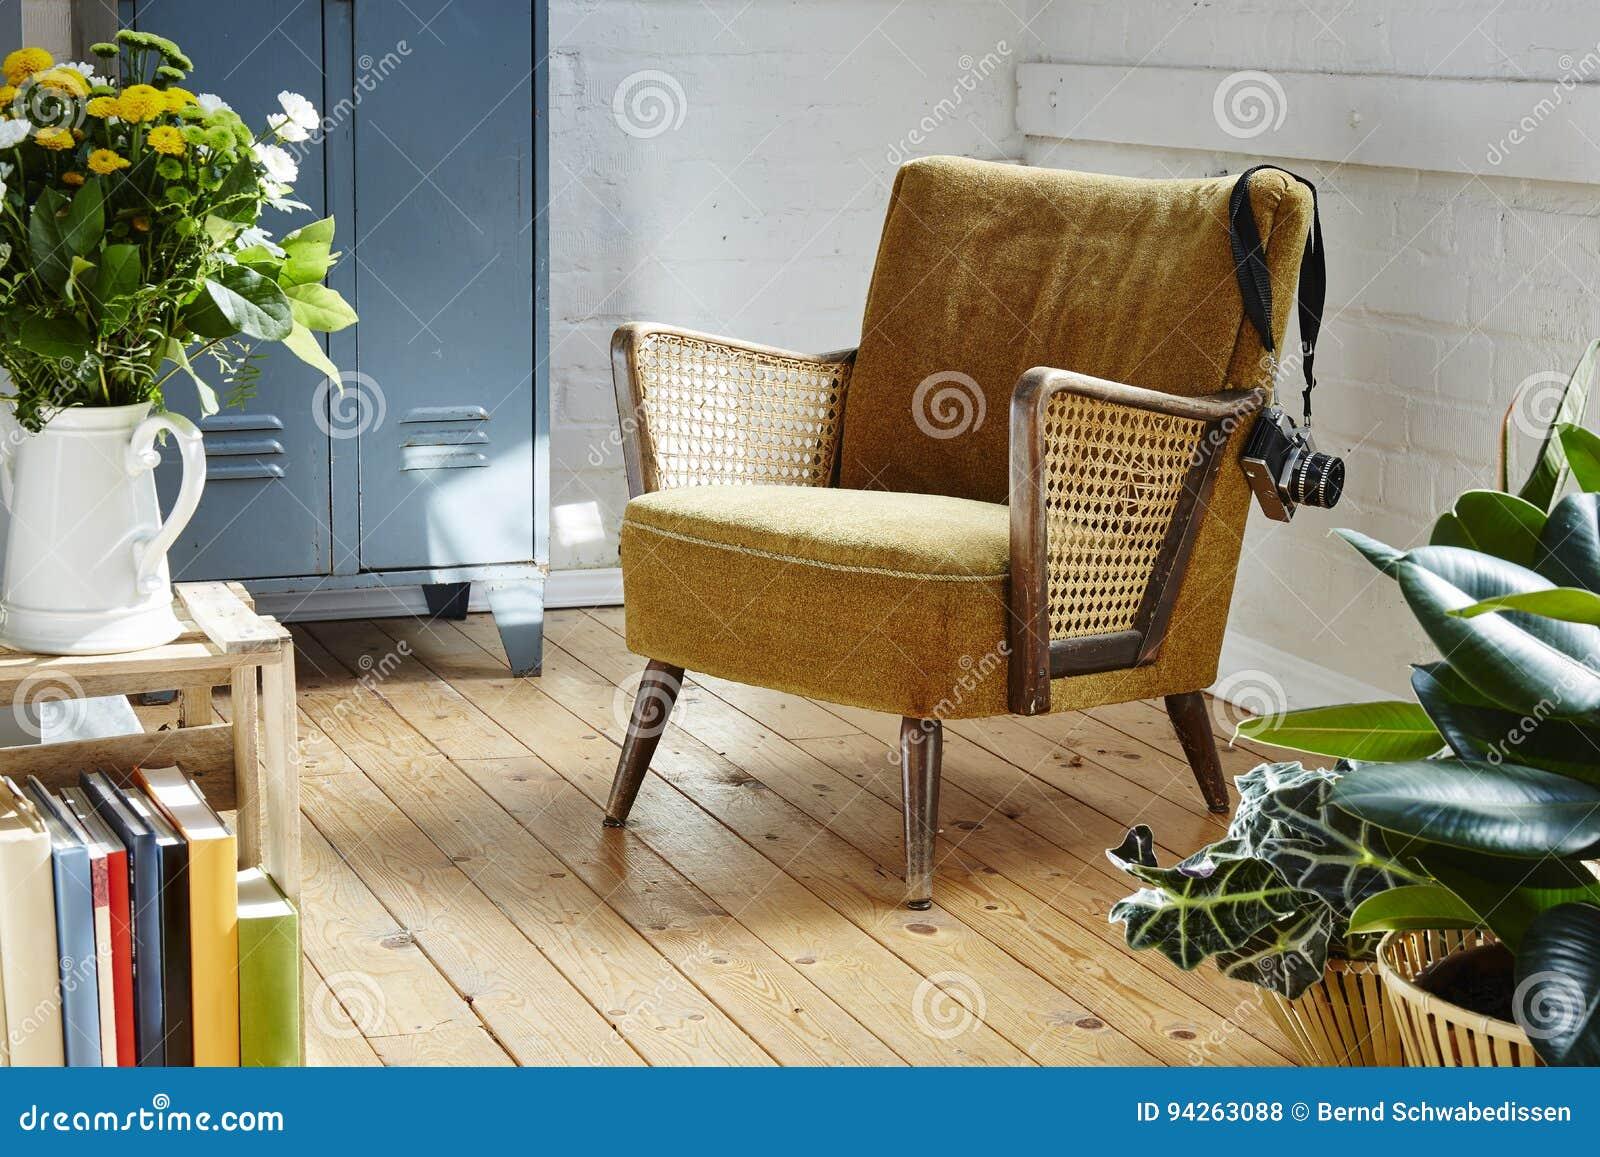 Vintage Easychair With Camera In Indutrial Loft Hipster Loft Studio Atelier  Interior Design